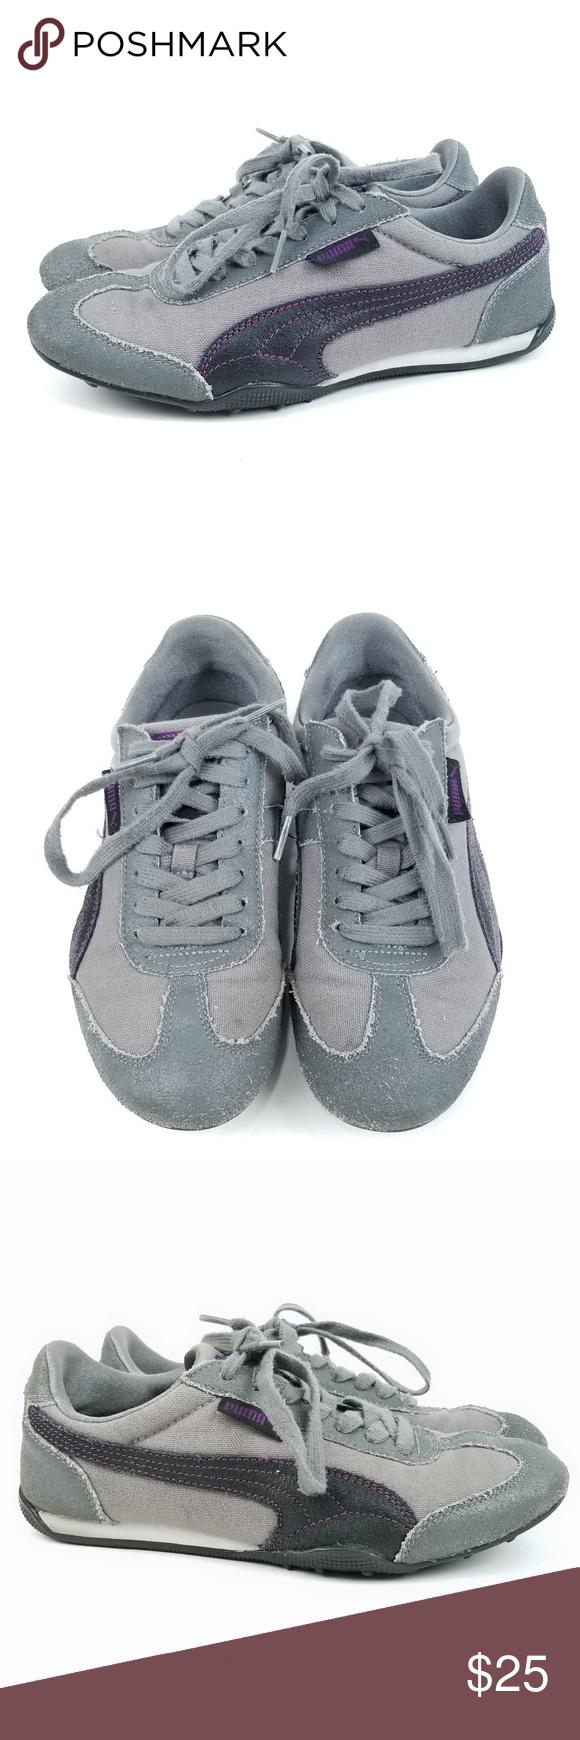 5709a9adb6ca Puma Easy Rider Retro Sneakers 7 EG05 Puma Easy Rider Retro Vintage  Sneakers Womens Size 7 Gray Ftwmc fvnmc Very Good Used Condition